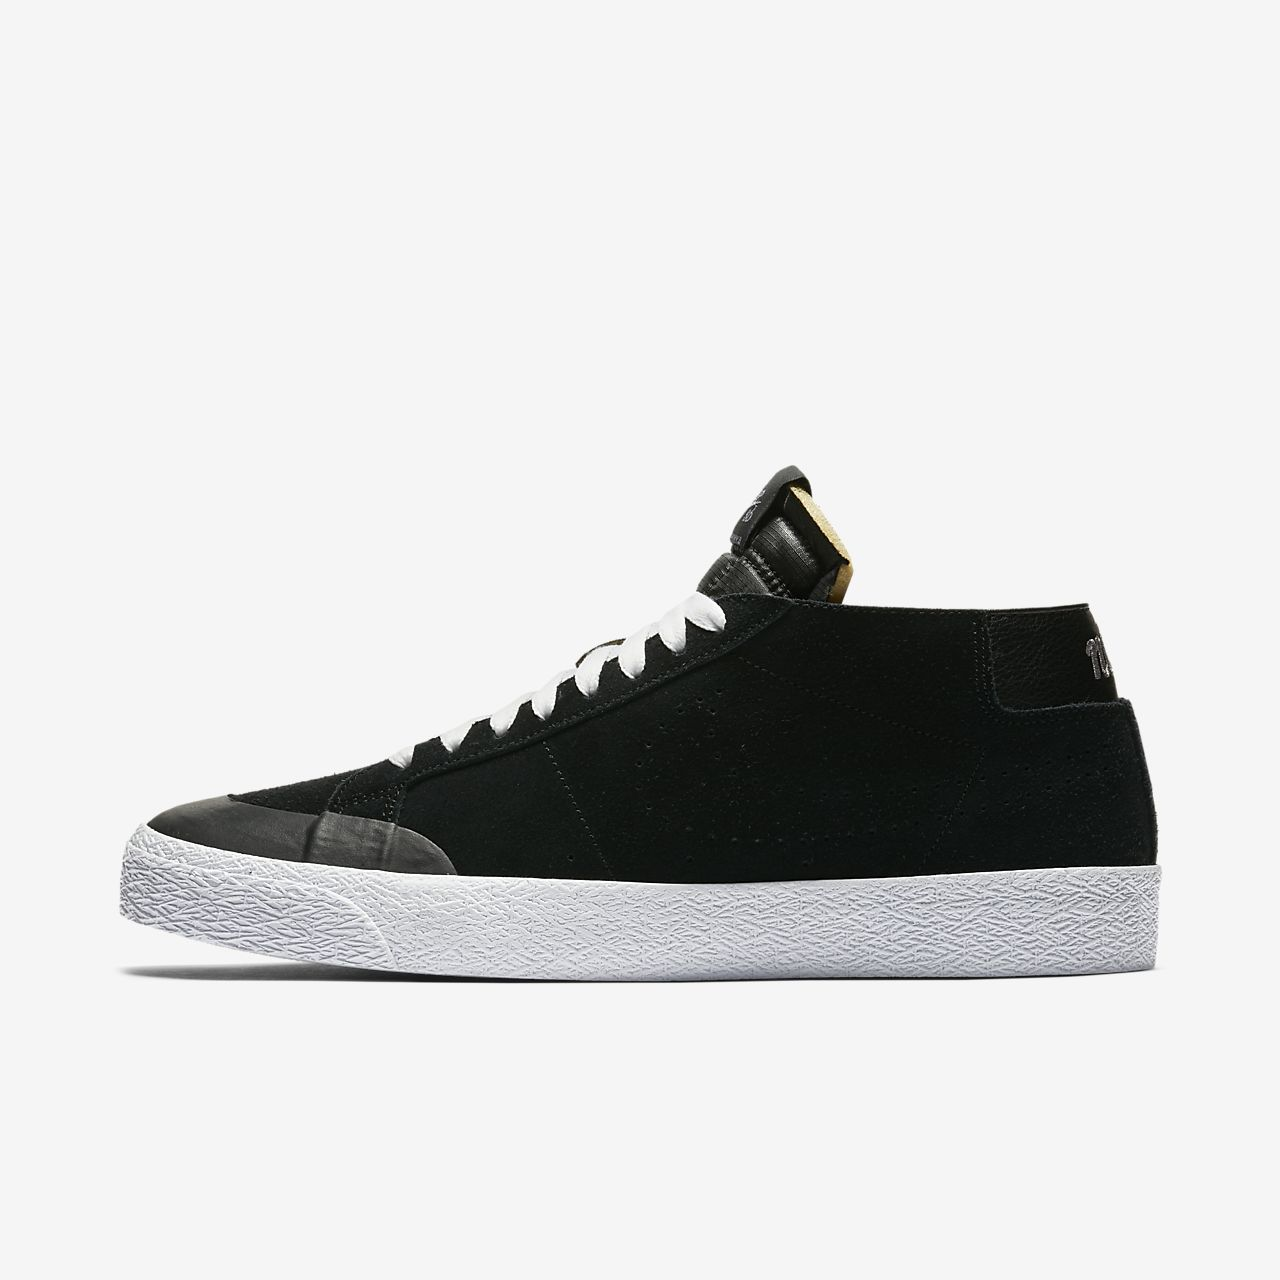 99581e08e852 Nike SB Zoom Blazer Chukka XT Men s Skateboarding Shoe. Nike.com GB